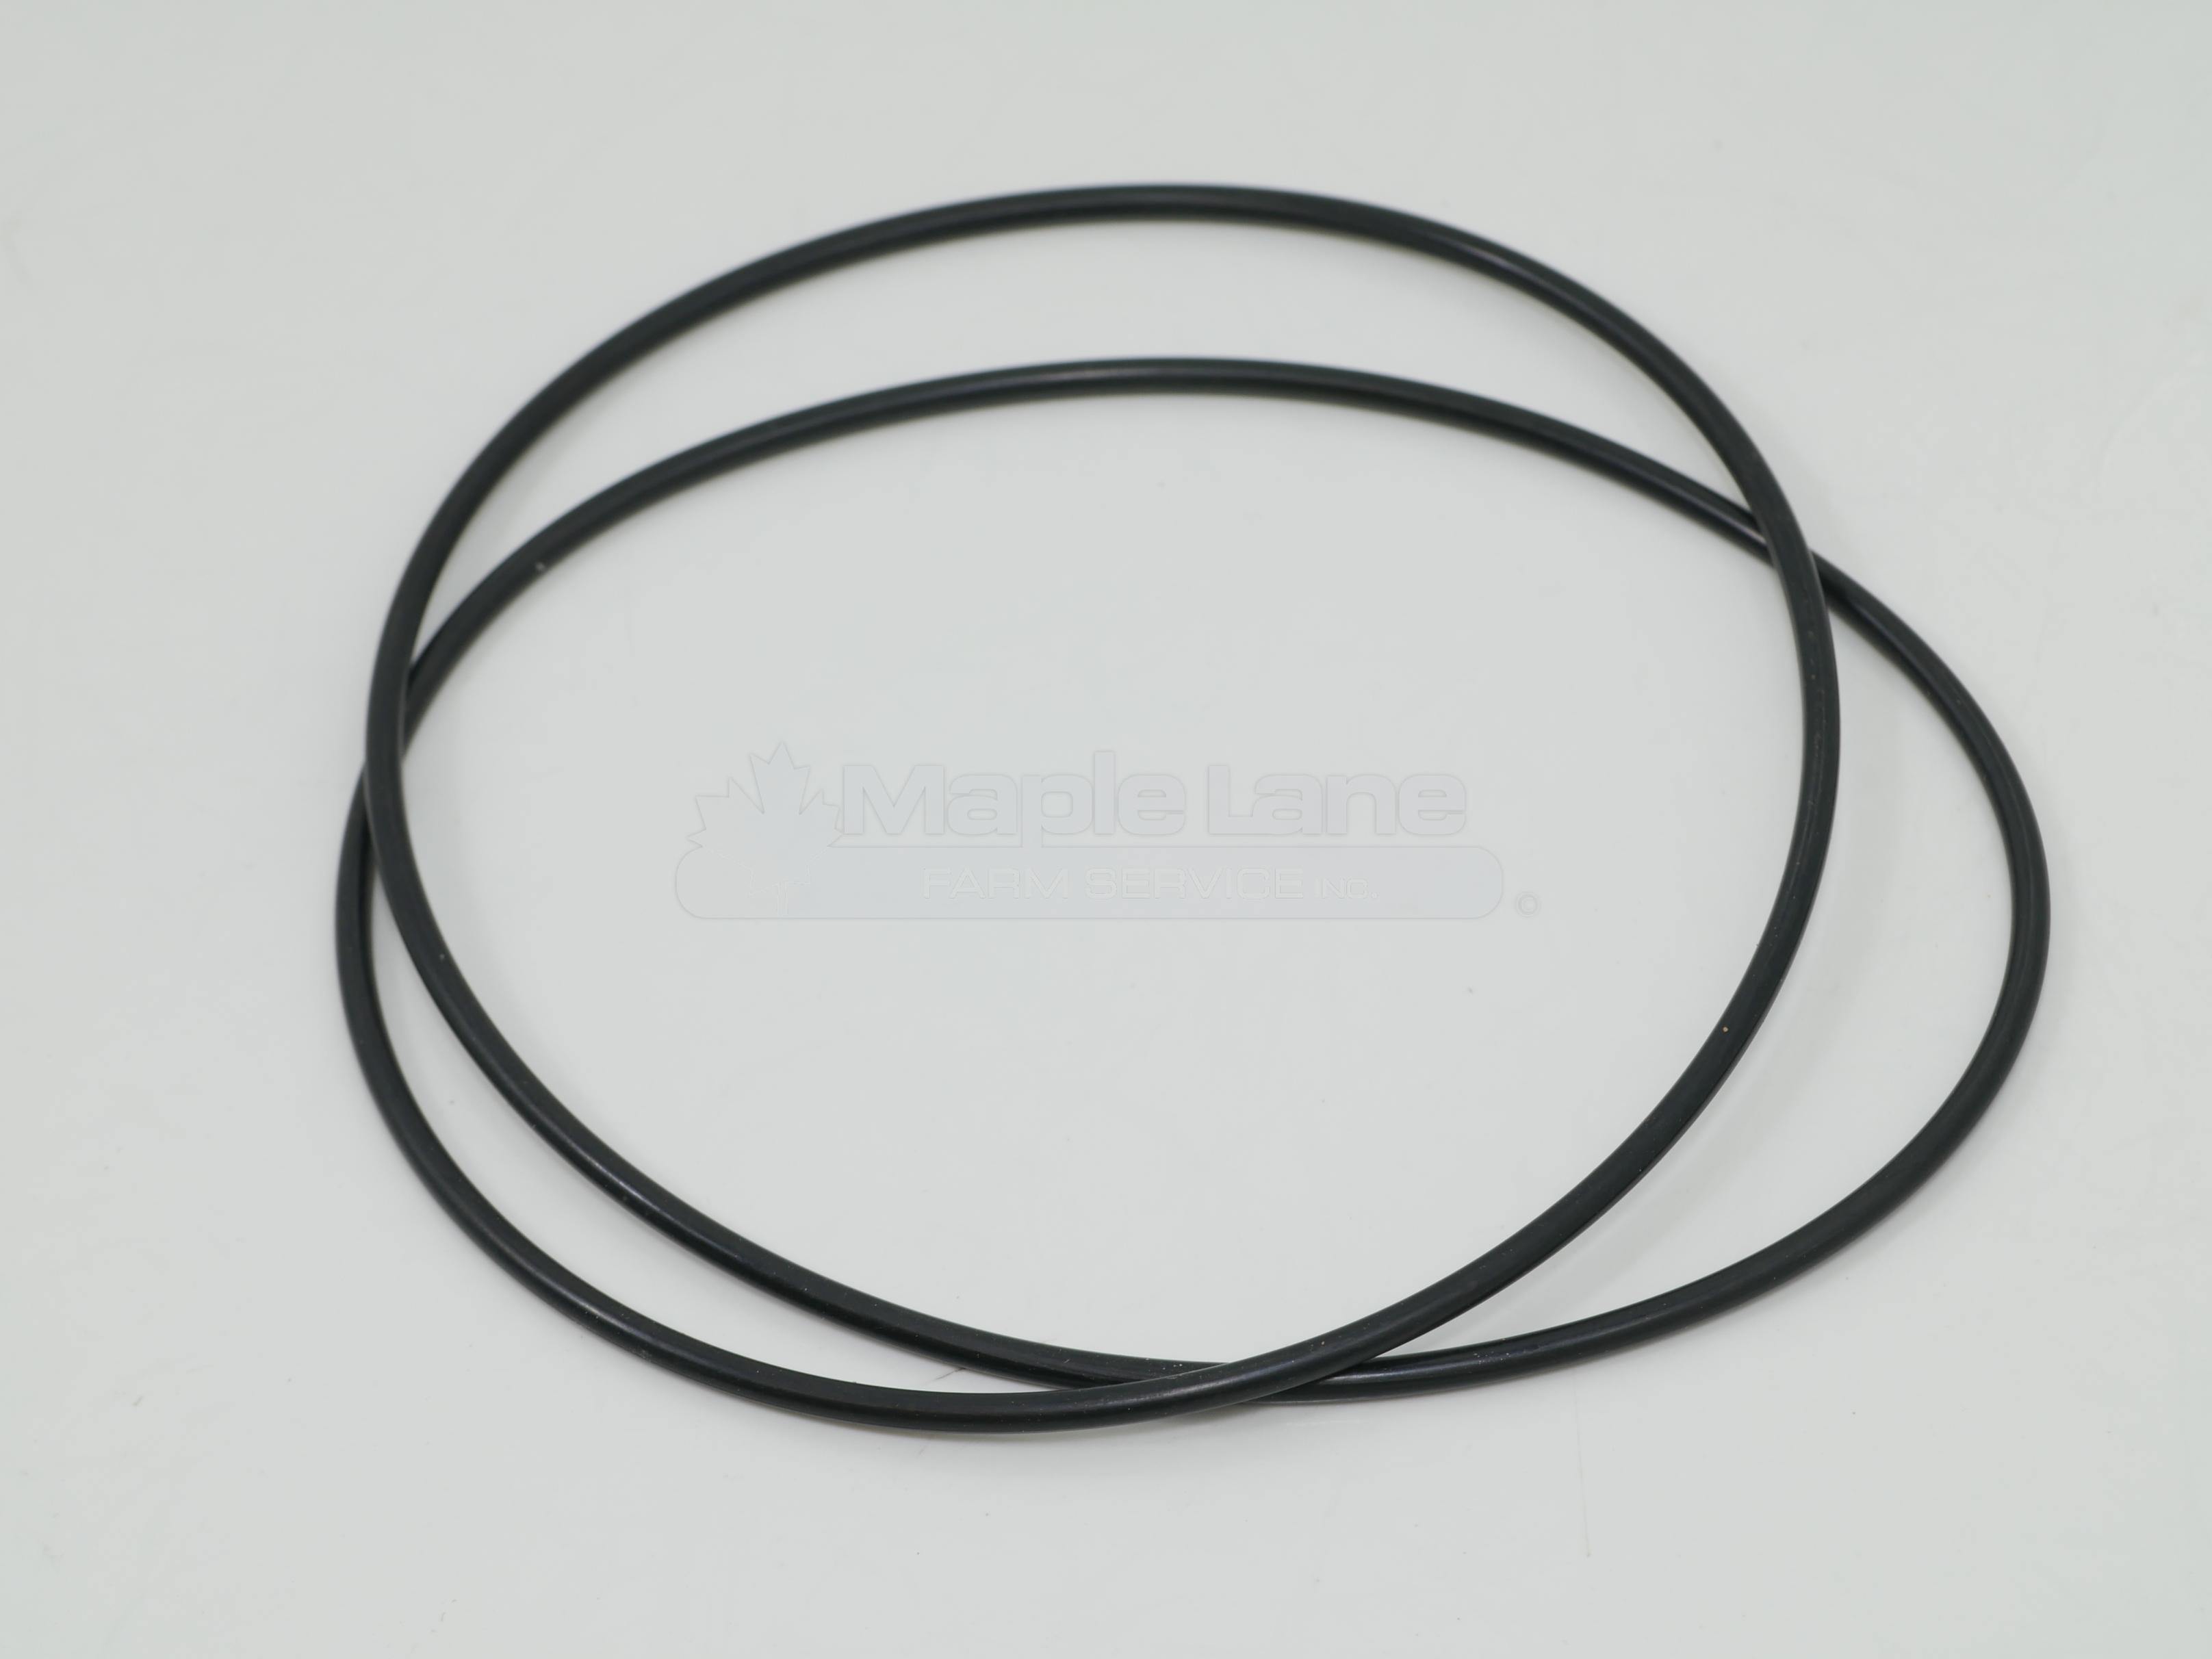 194250 o-ring